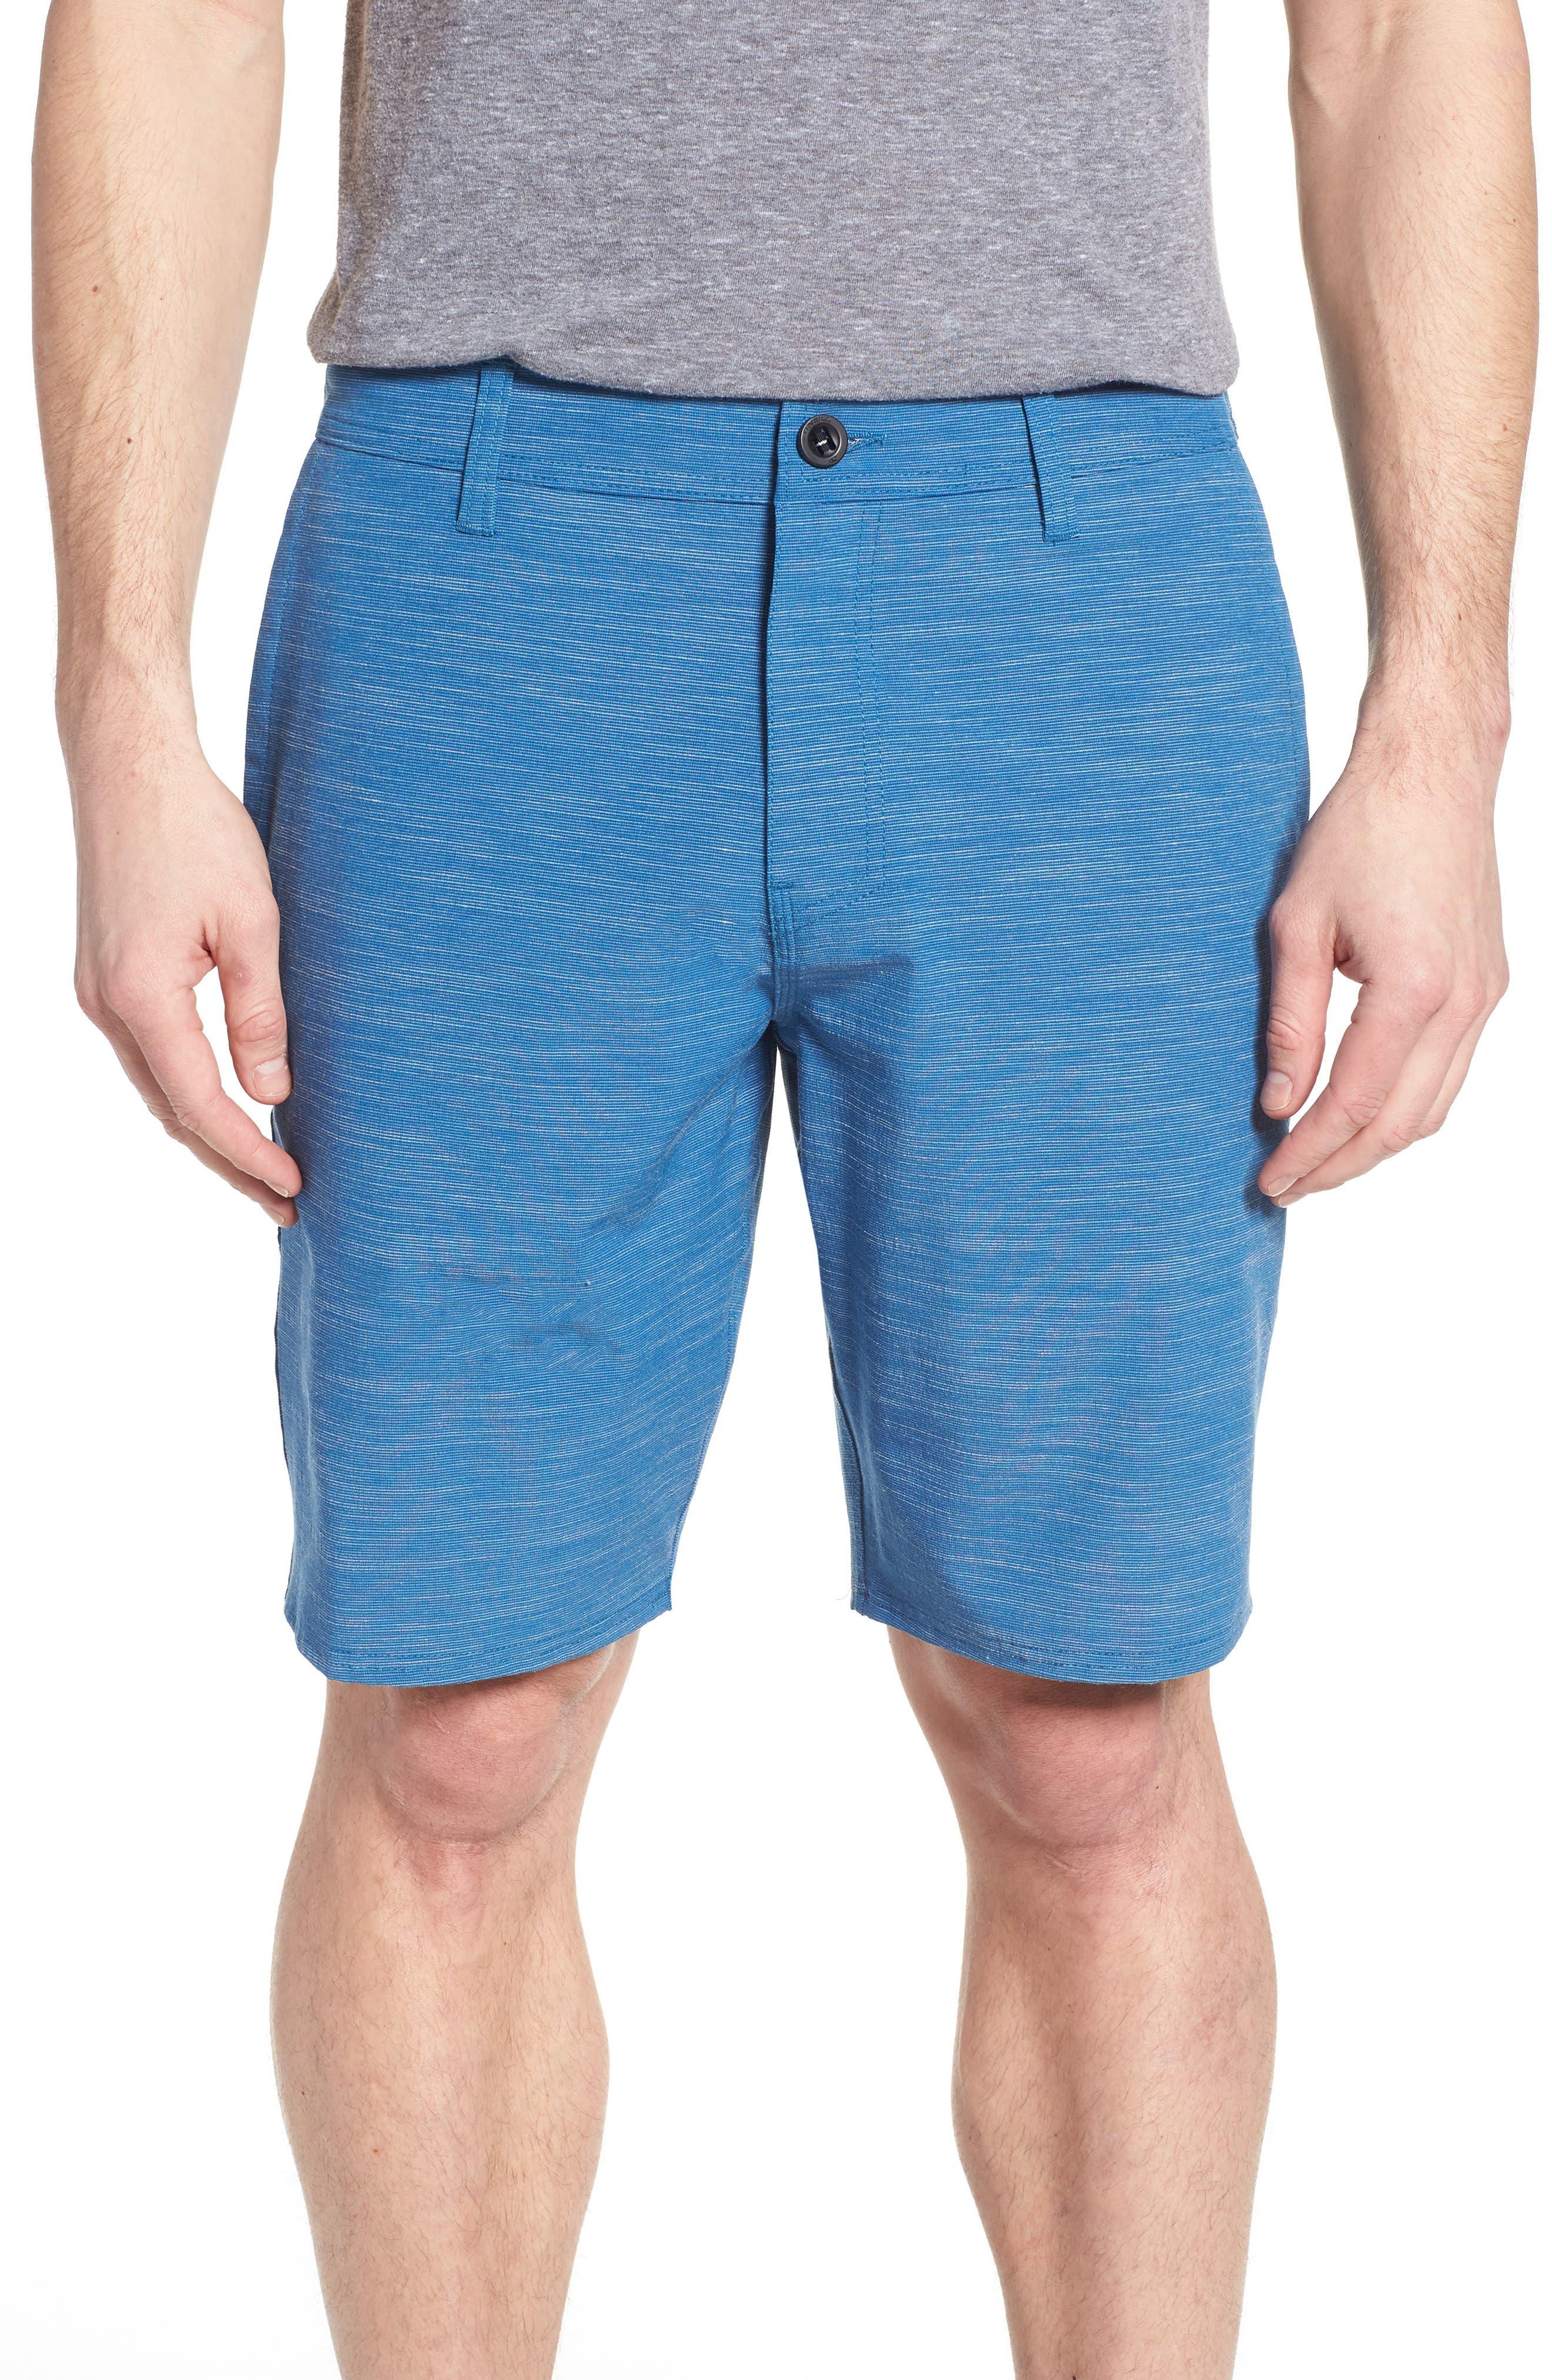 Locked Slub Hybrid Shorts,                             Main thumbnail 1, color,                             Air Force Blue